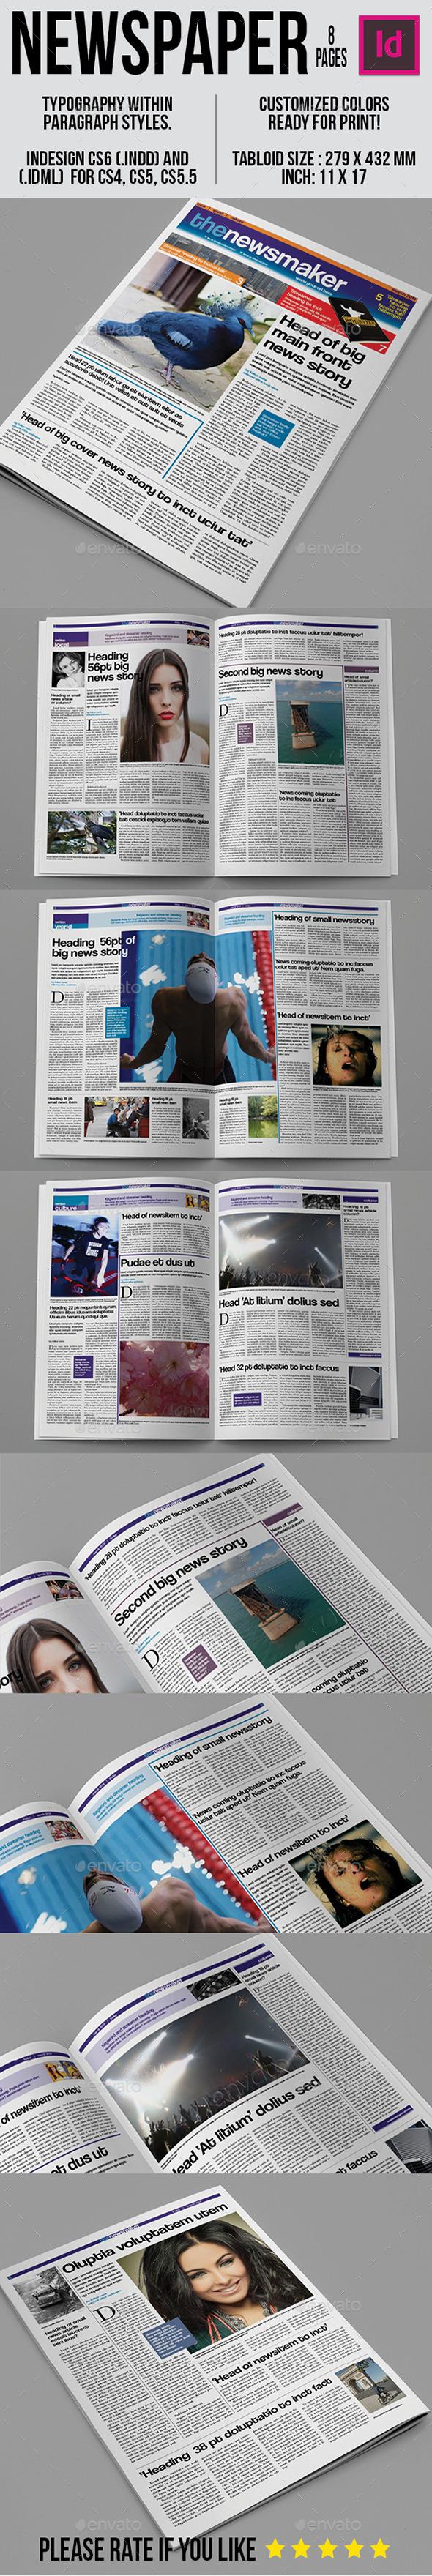 Tabloid Newspaper Template - Newsletters Print Templates